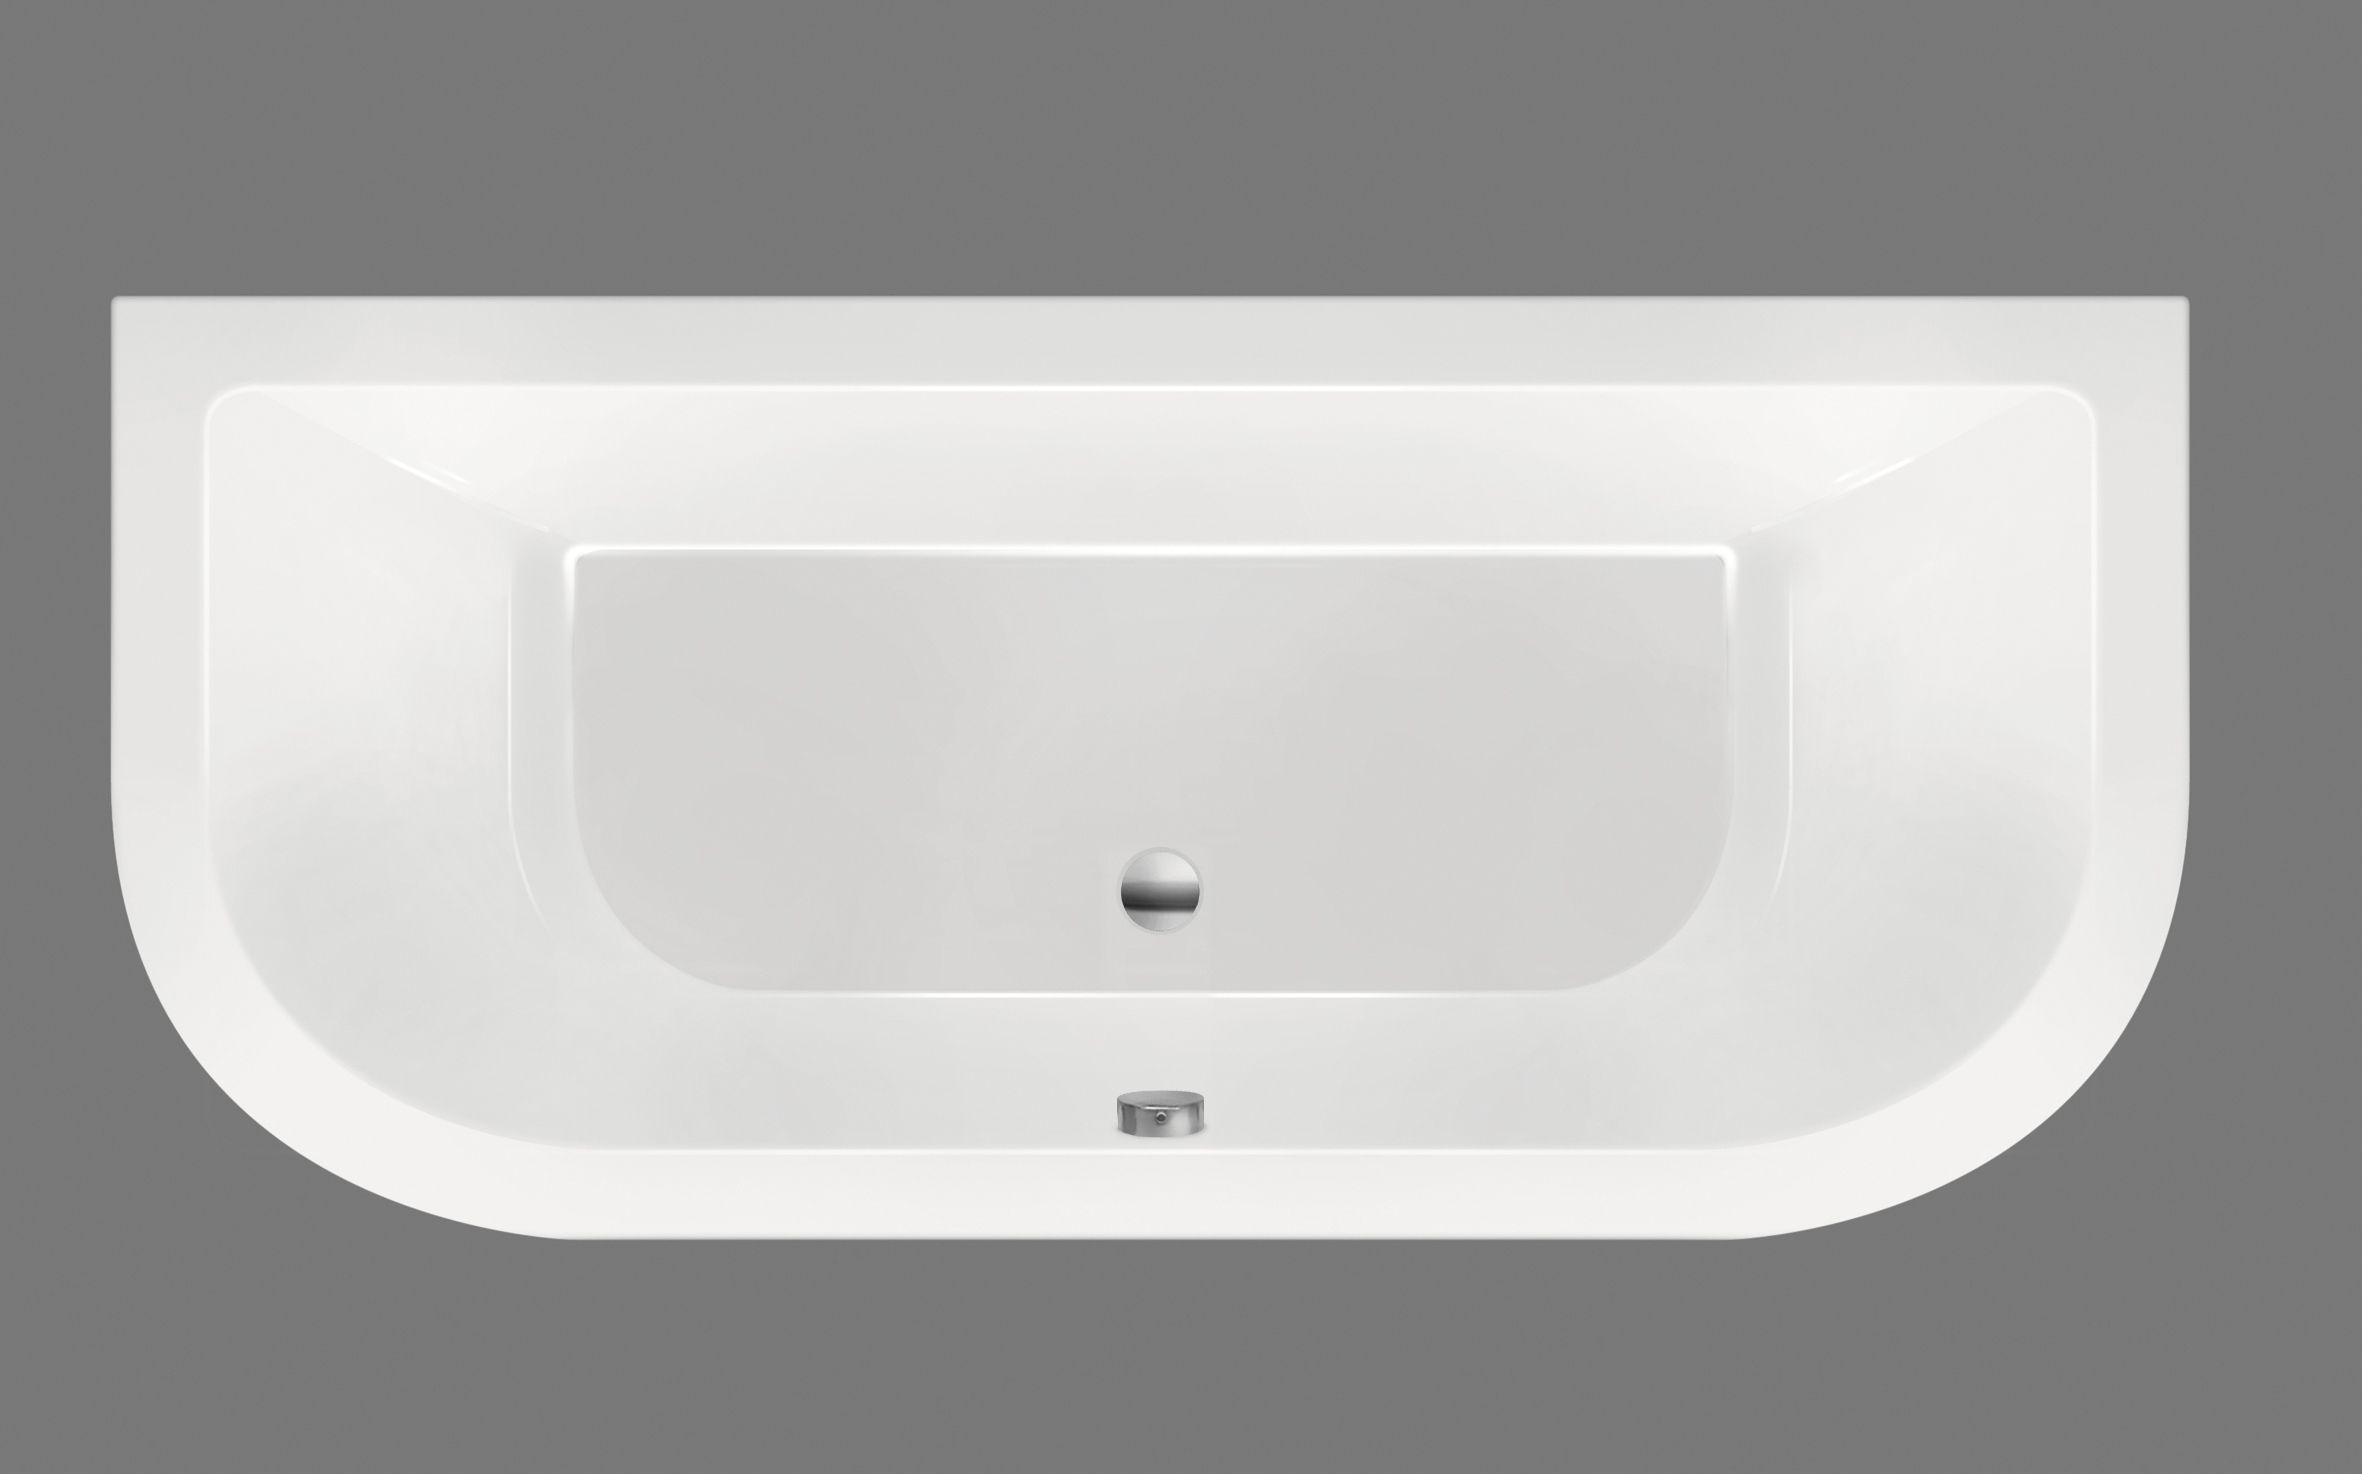 Xenz Principe badkuip 180x80x50cm wit